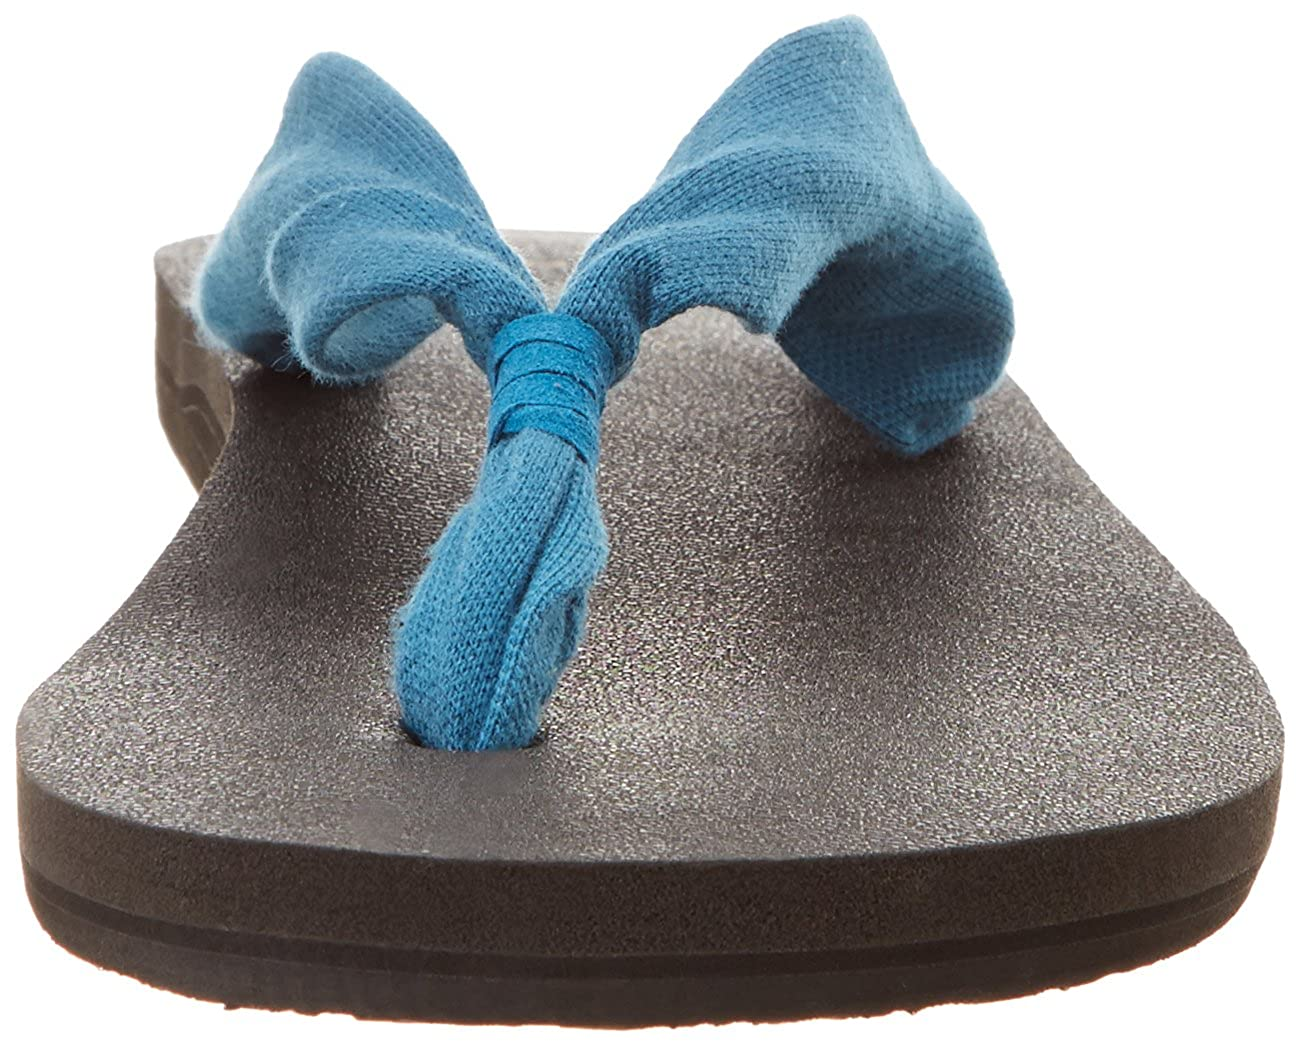 Sanuk Damens's Damens's Sanuk Yoga Slinger Flip-Flop Indigo c3830d